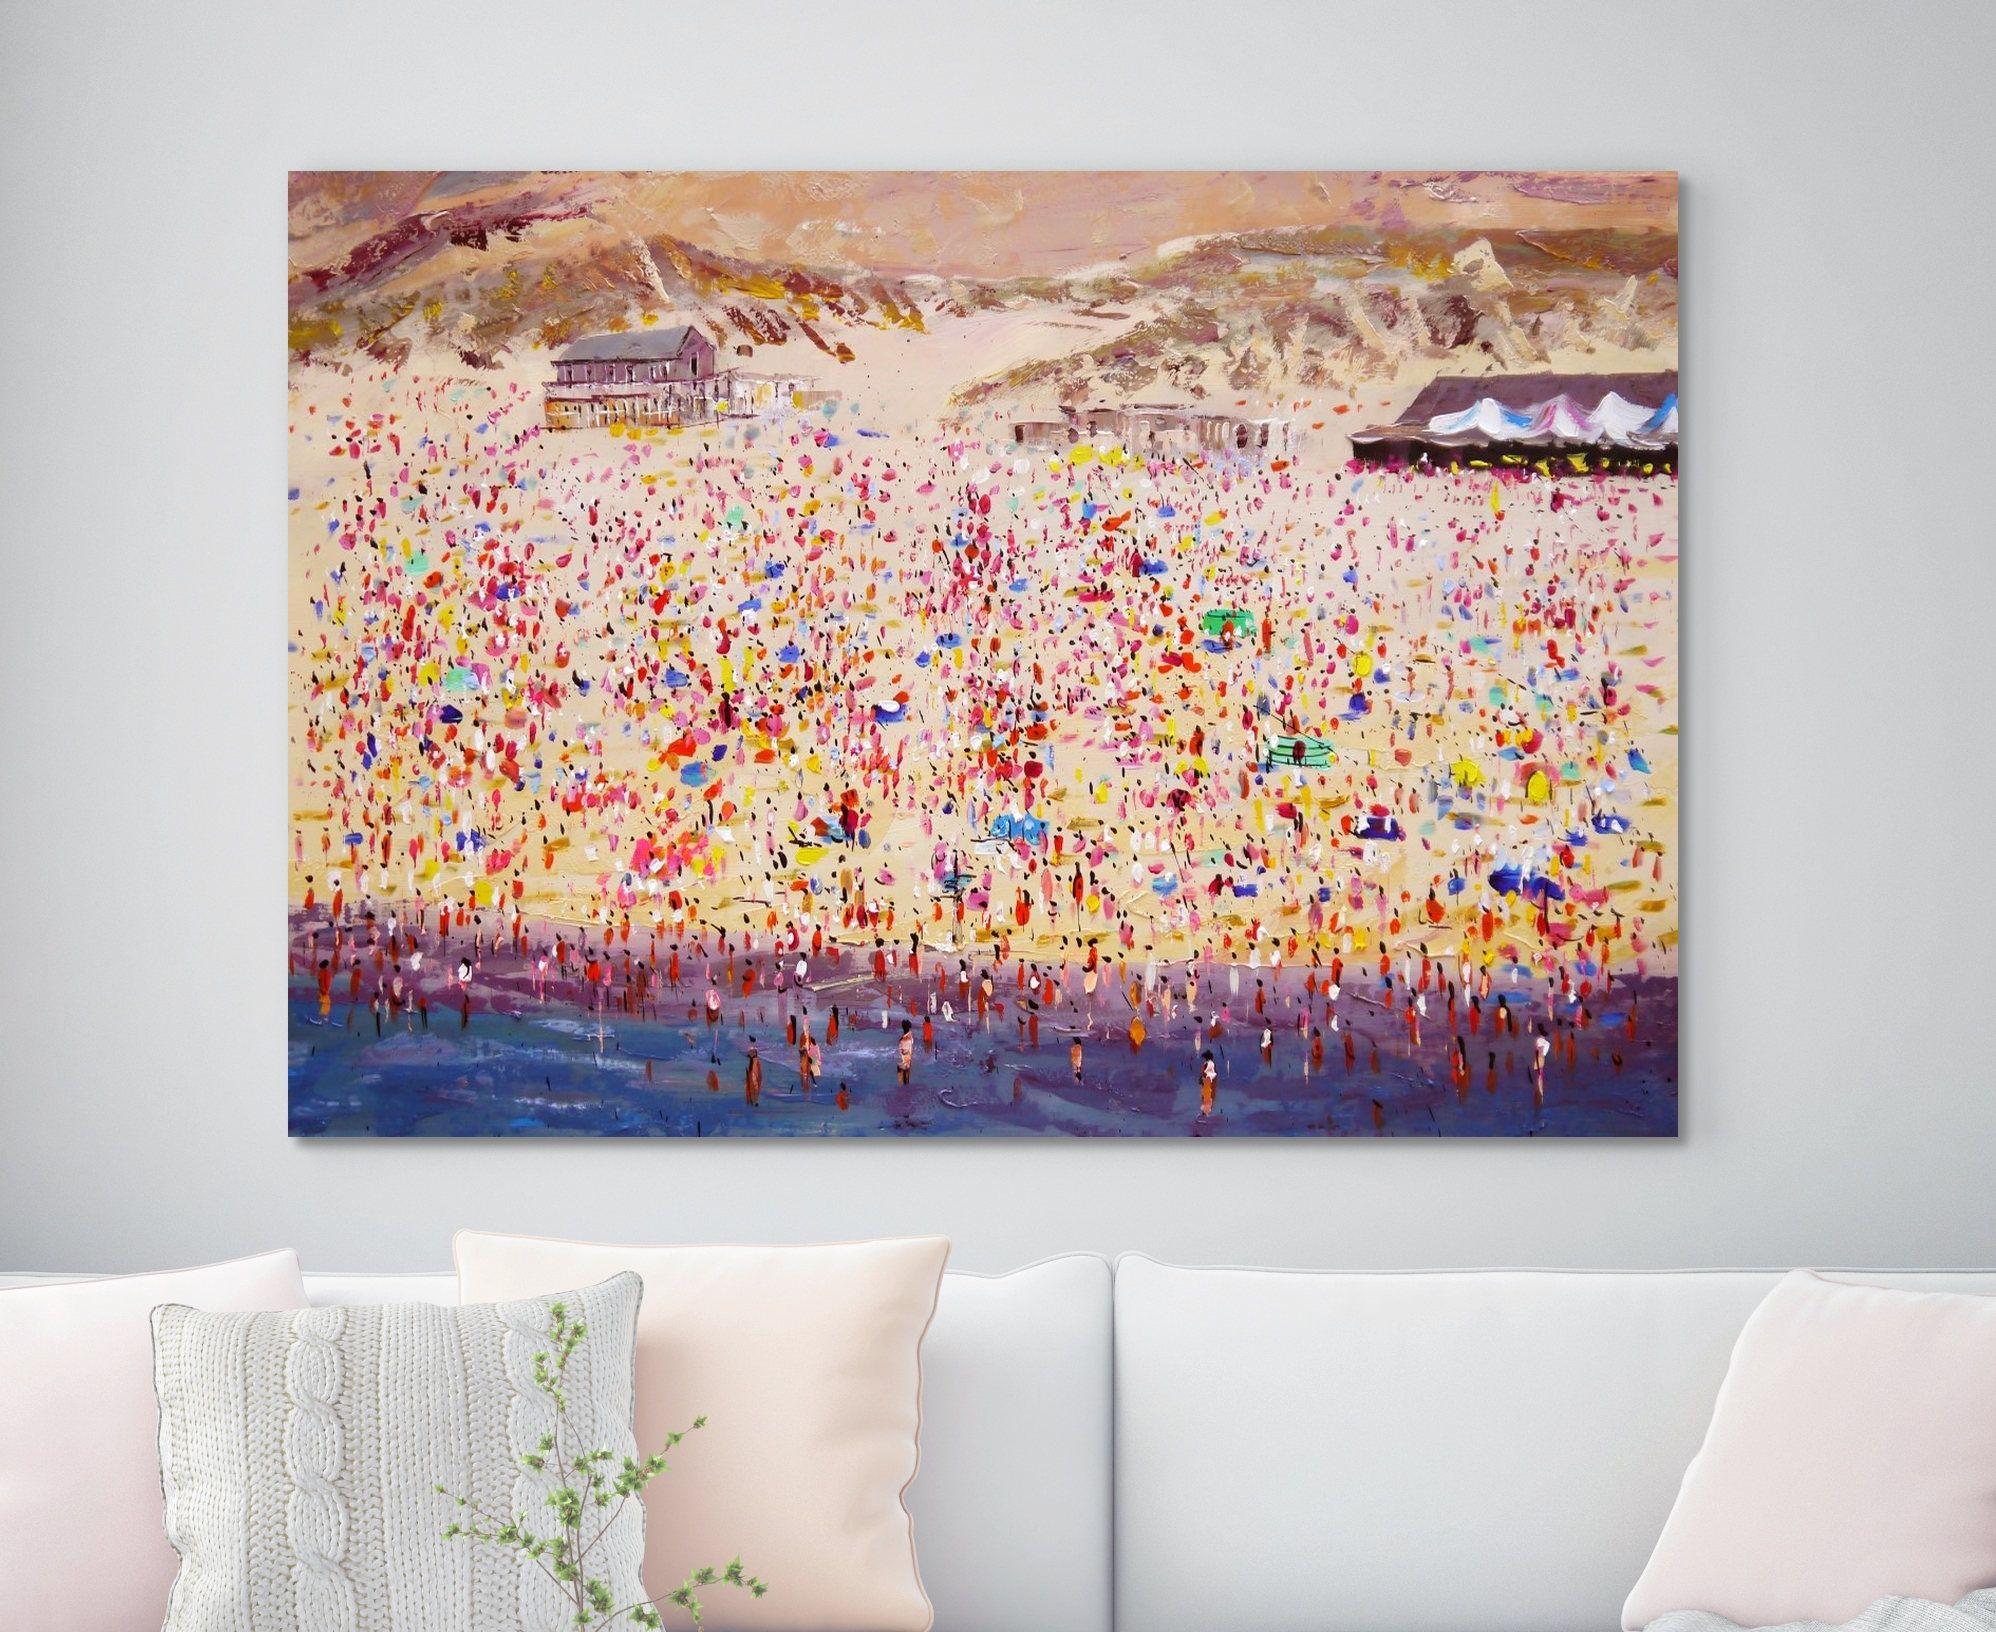 Large original oil painting canvas wall art painting huge people seascape beach art landscape summer sand sunny 31 x 55 80 cm x 140 cm